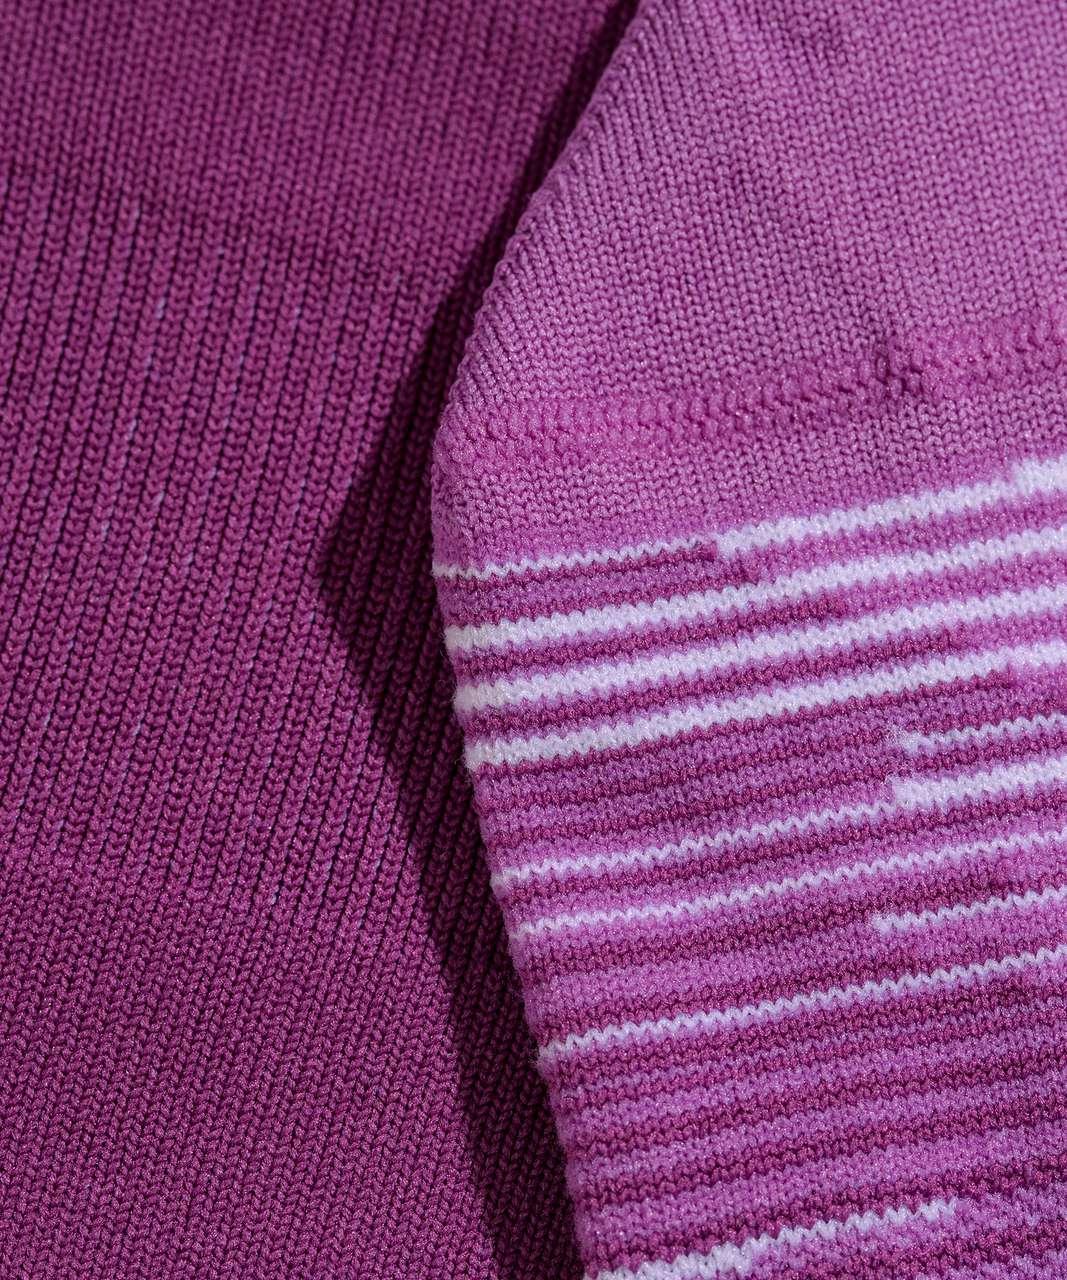 Lululemon Play All Day Sock - Prince Purple / Dark Mystic